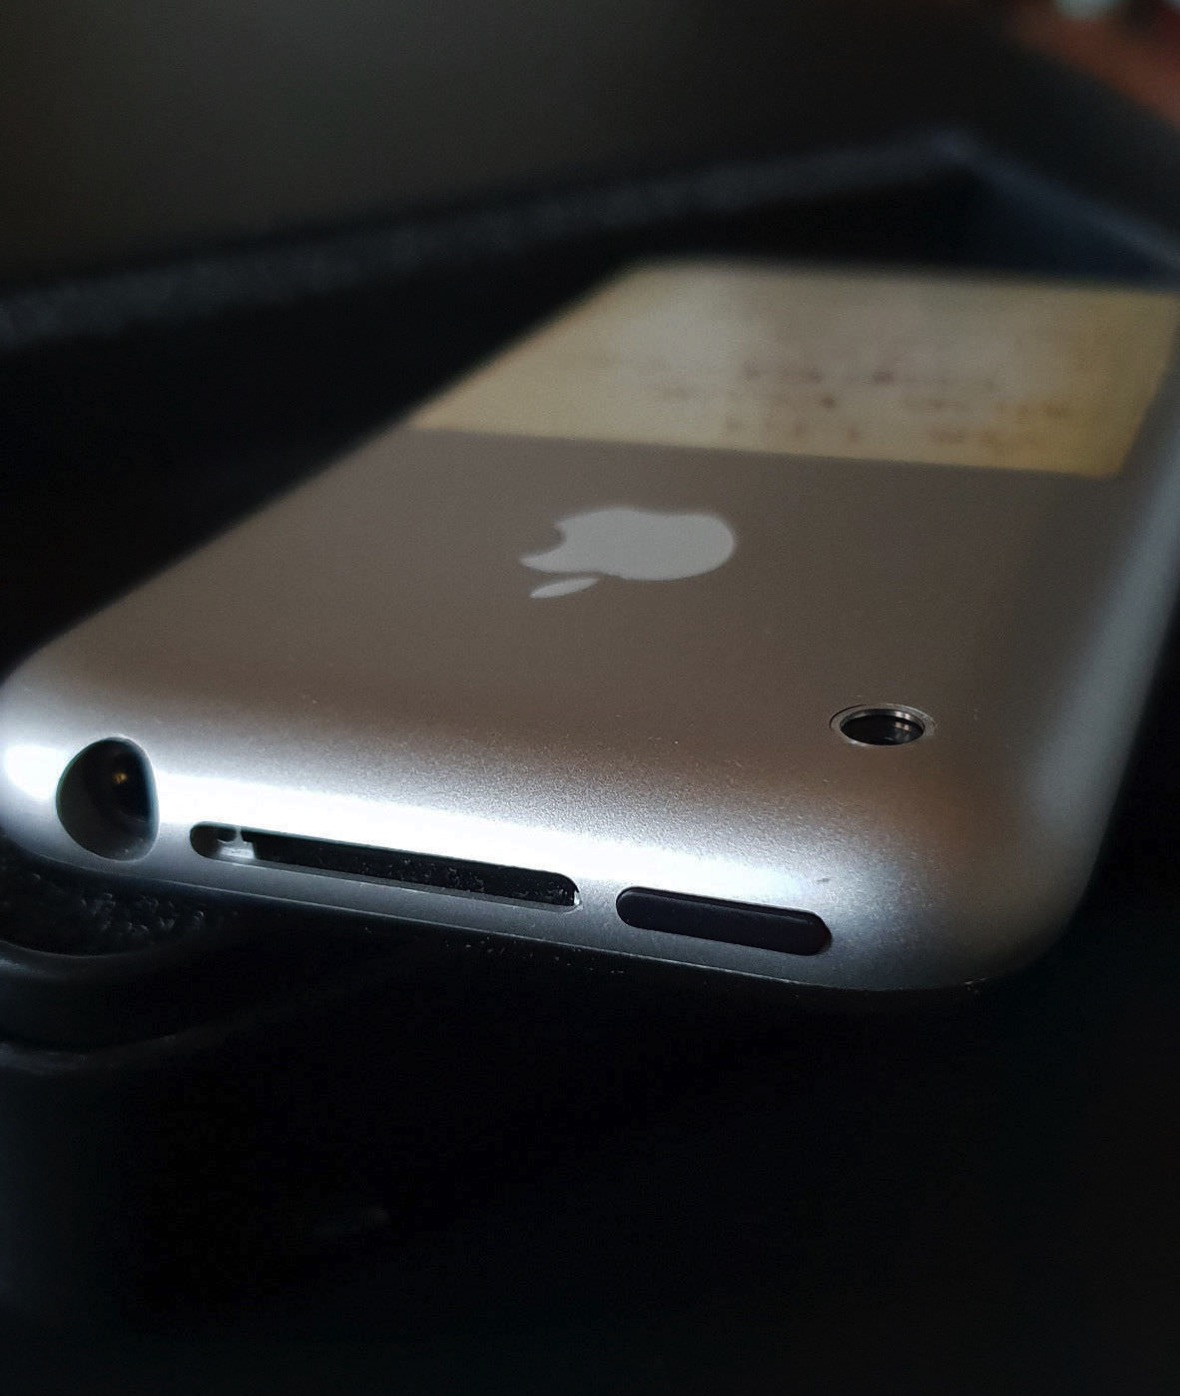 Prototype-Original-iPhone-on-ebay-2-2.jpg